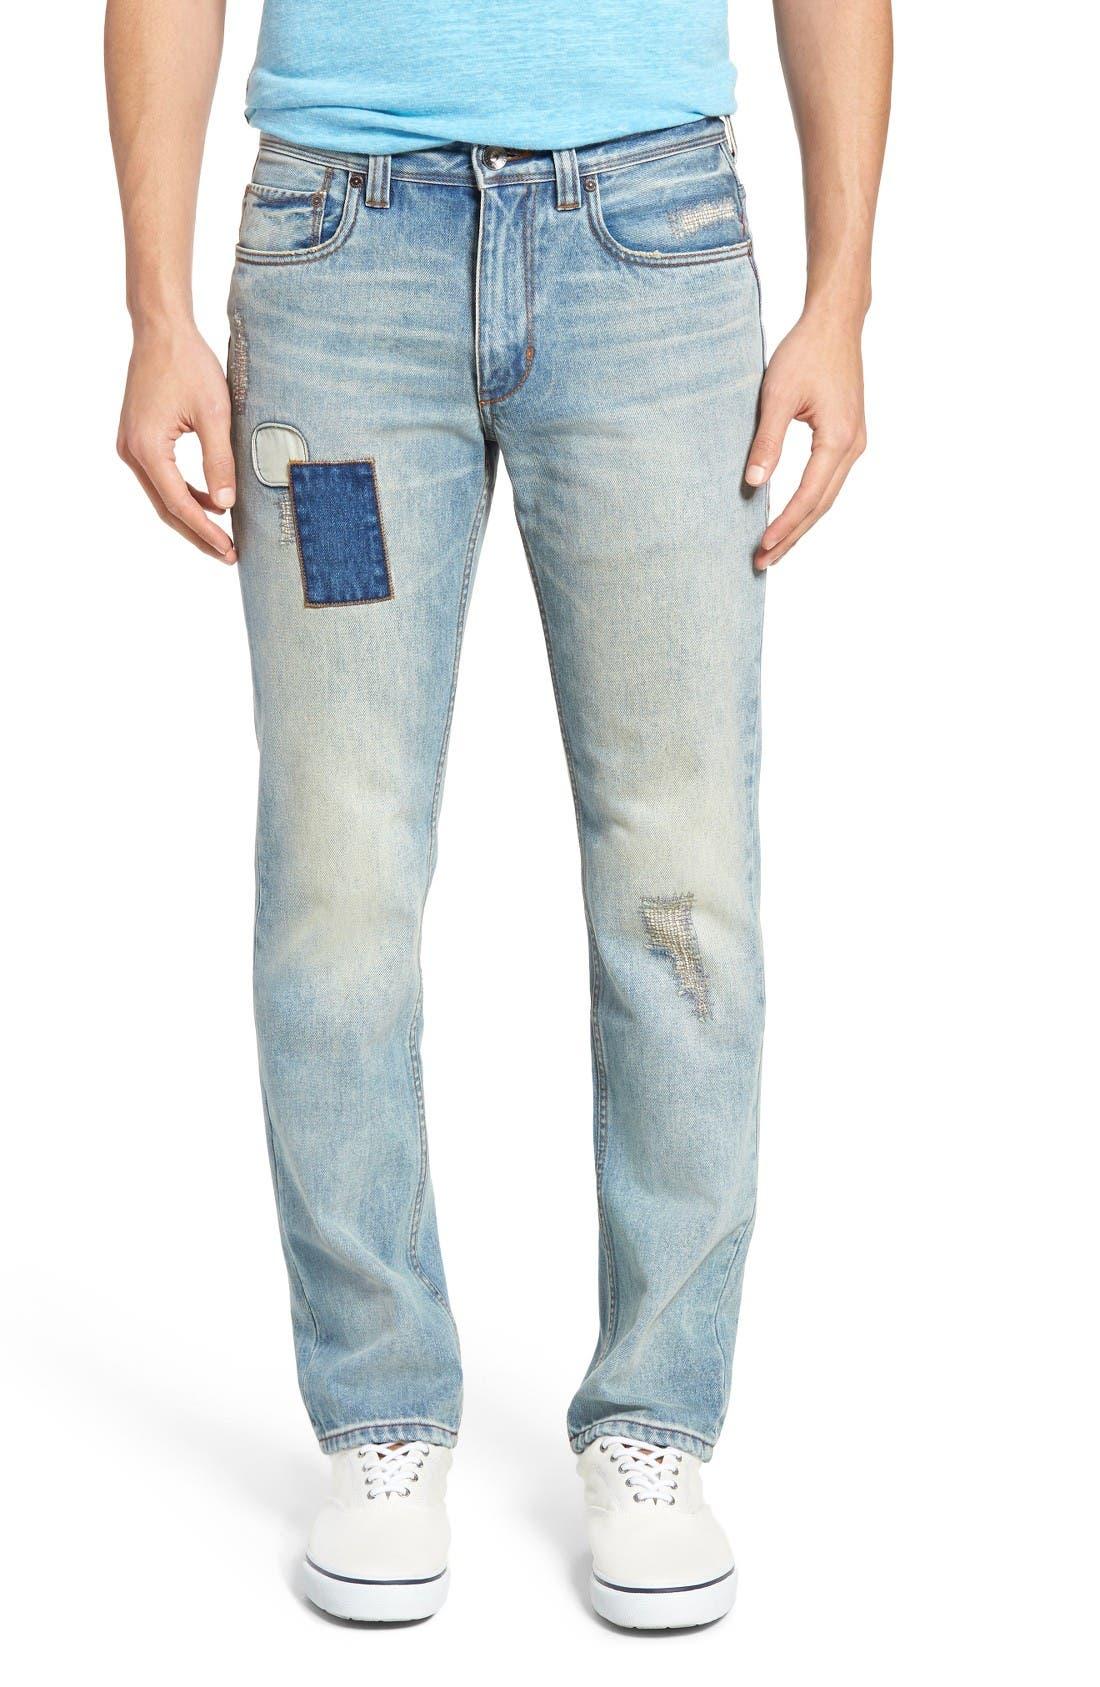 Main Image - Tommy Bahama Castaway Slim Fit Jeans (Bleached Vintage Wash)